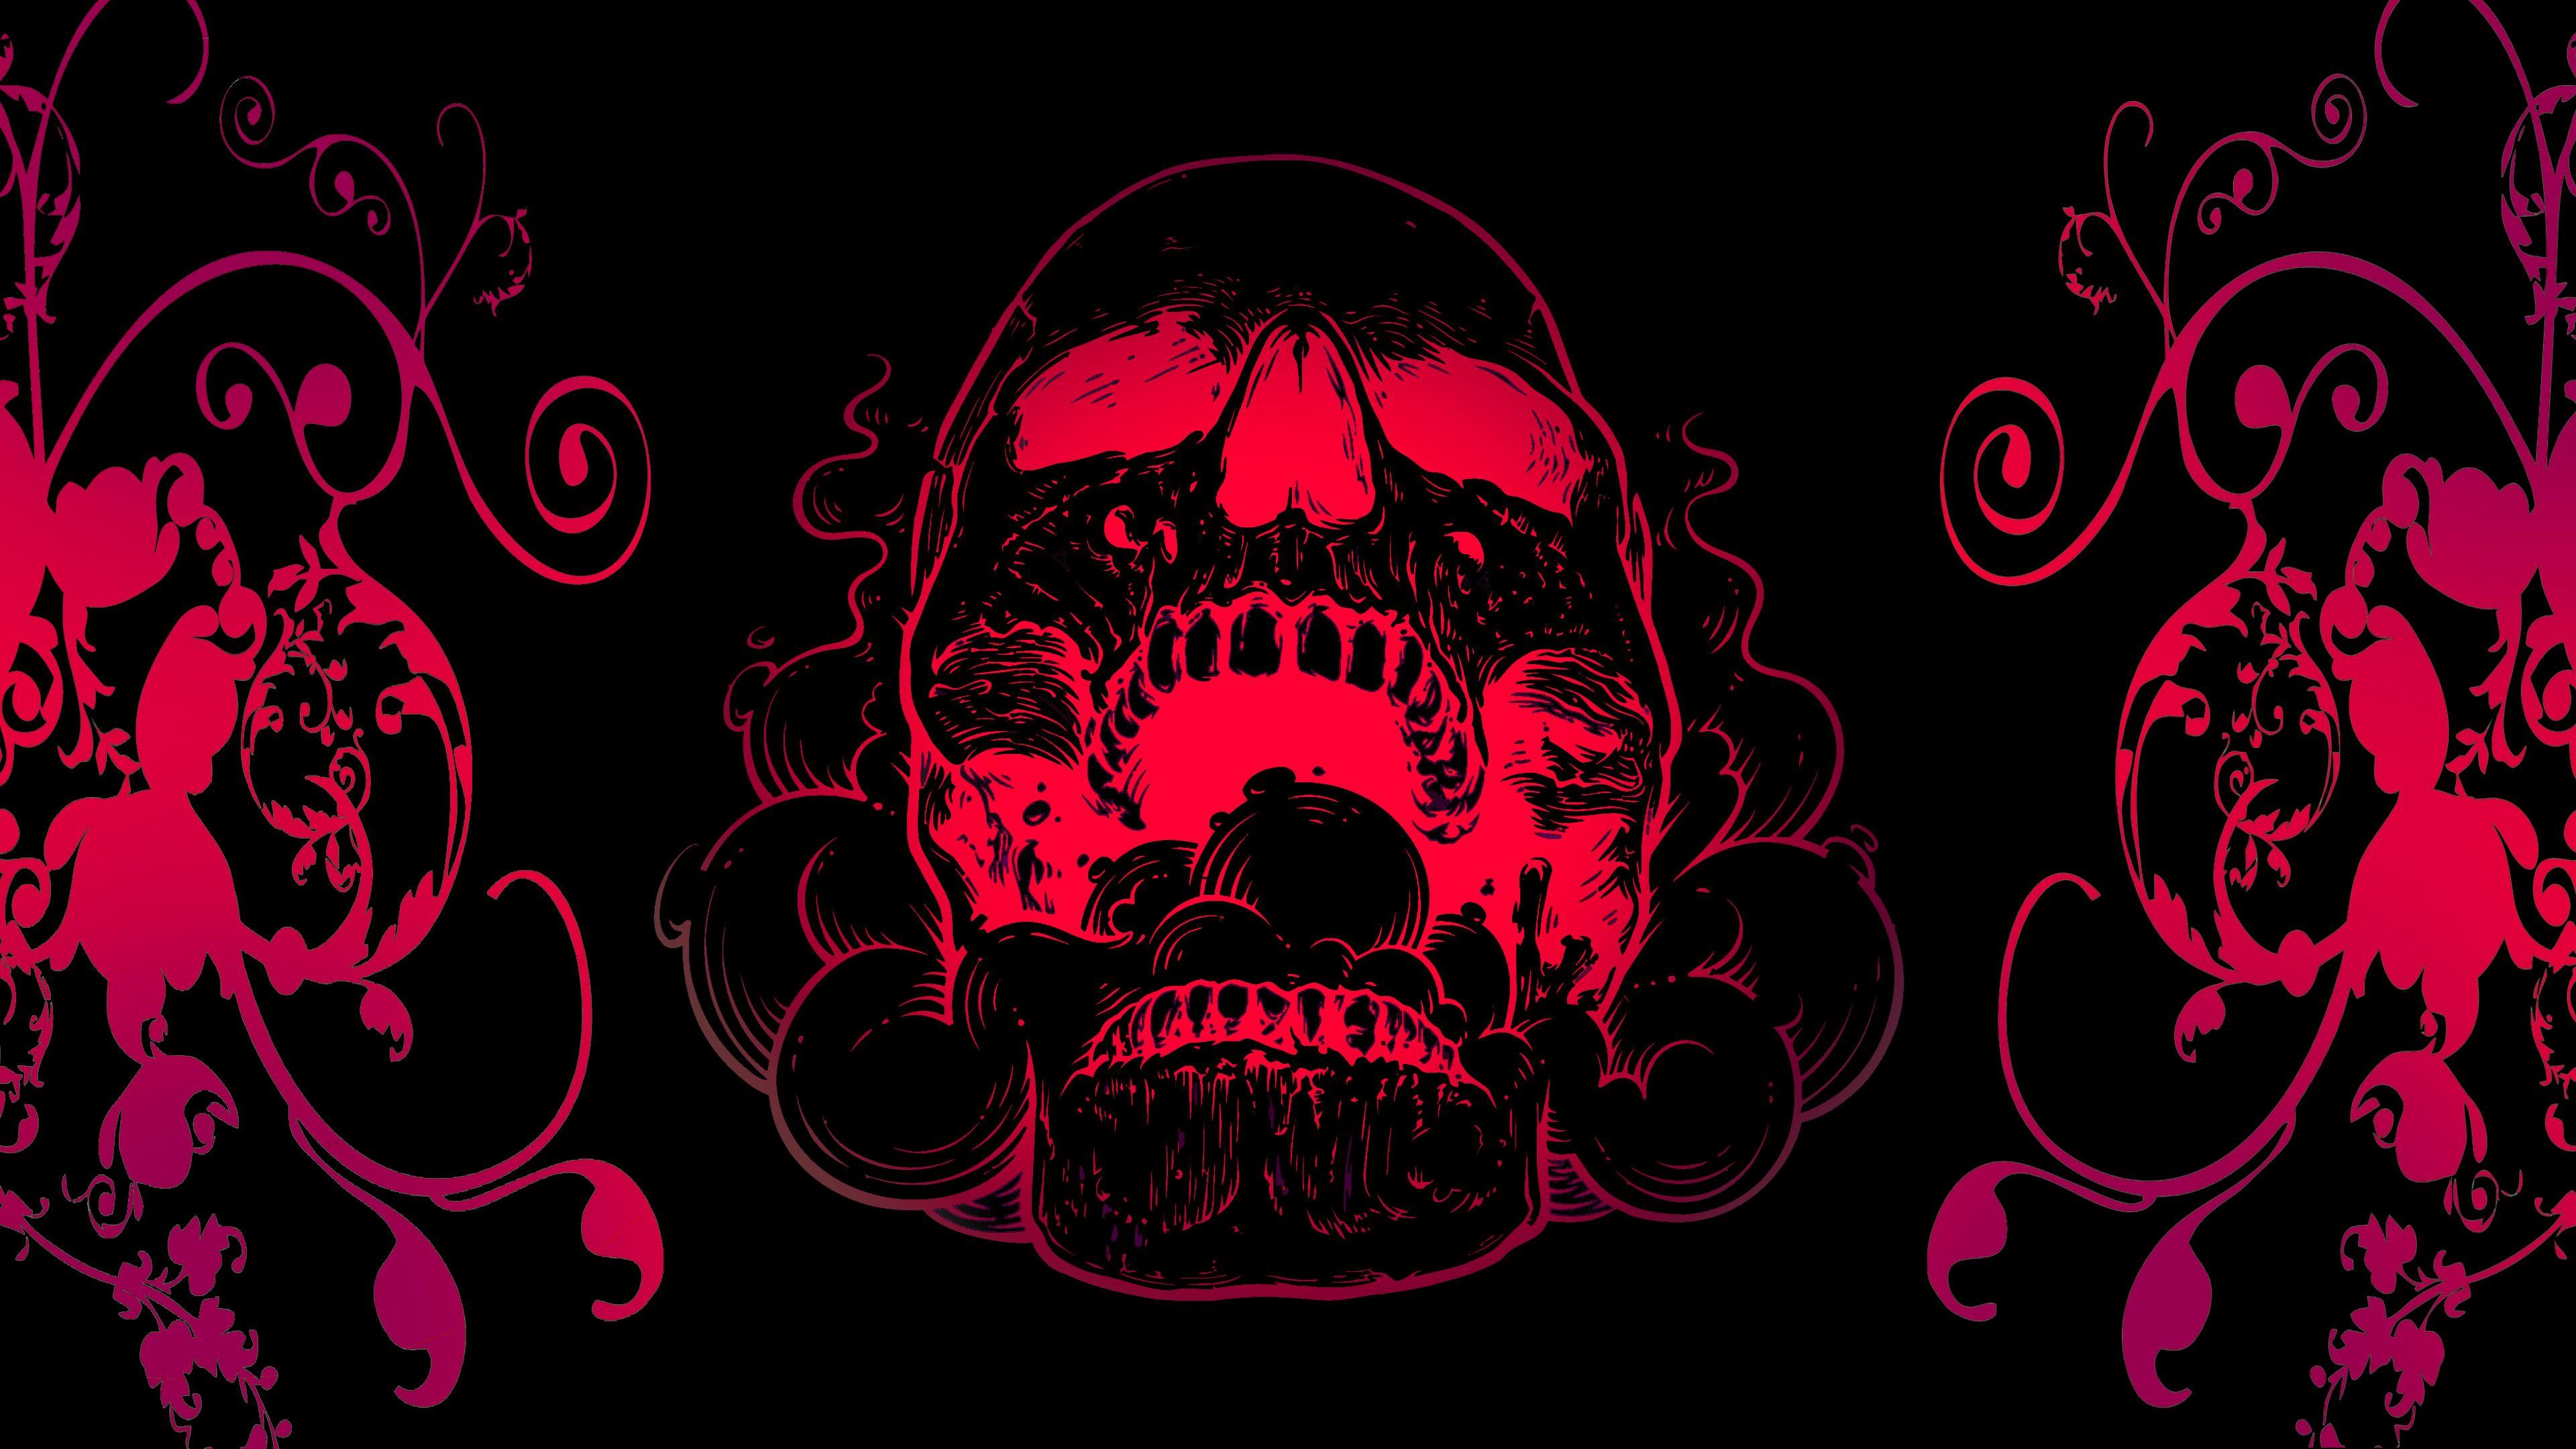 Dark Skull Evil Horror Skulls Art Artwork Skeleton D Wallpaper 1920x1440 694562 Wallpaperup Black Skulls Wallpaper Skull Wallpaper Skull Pictures